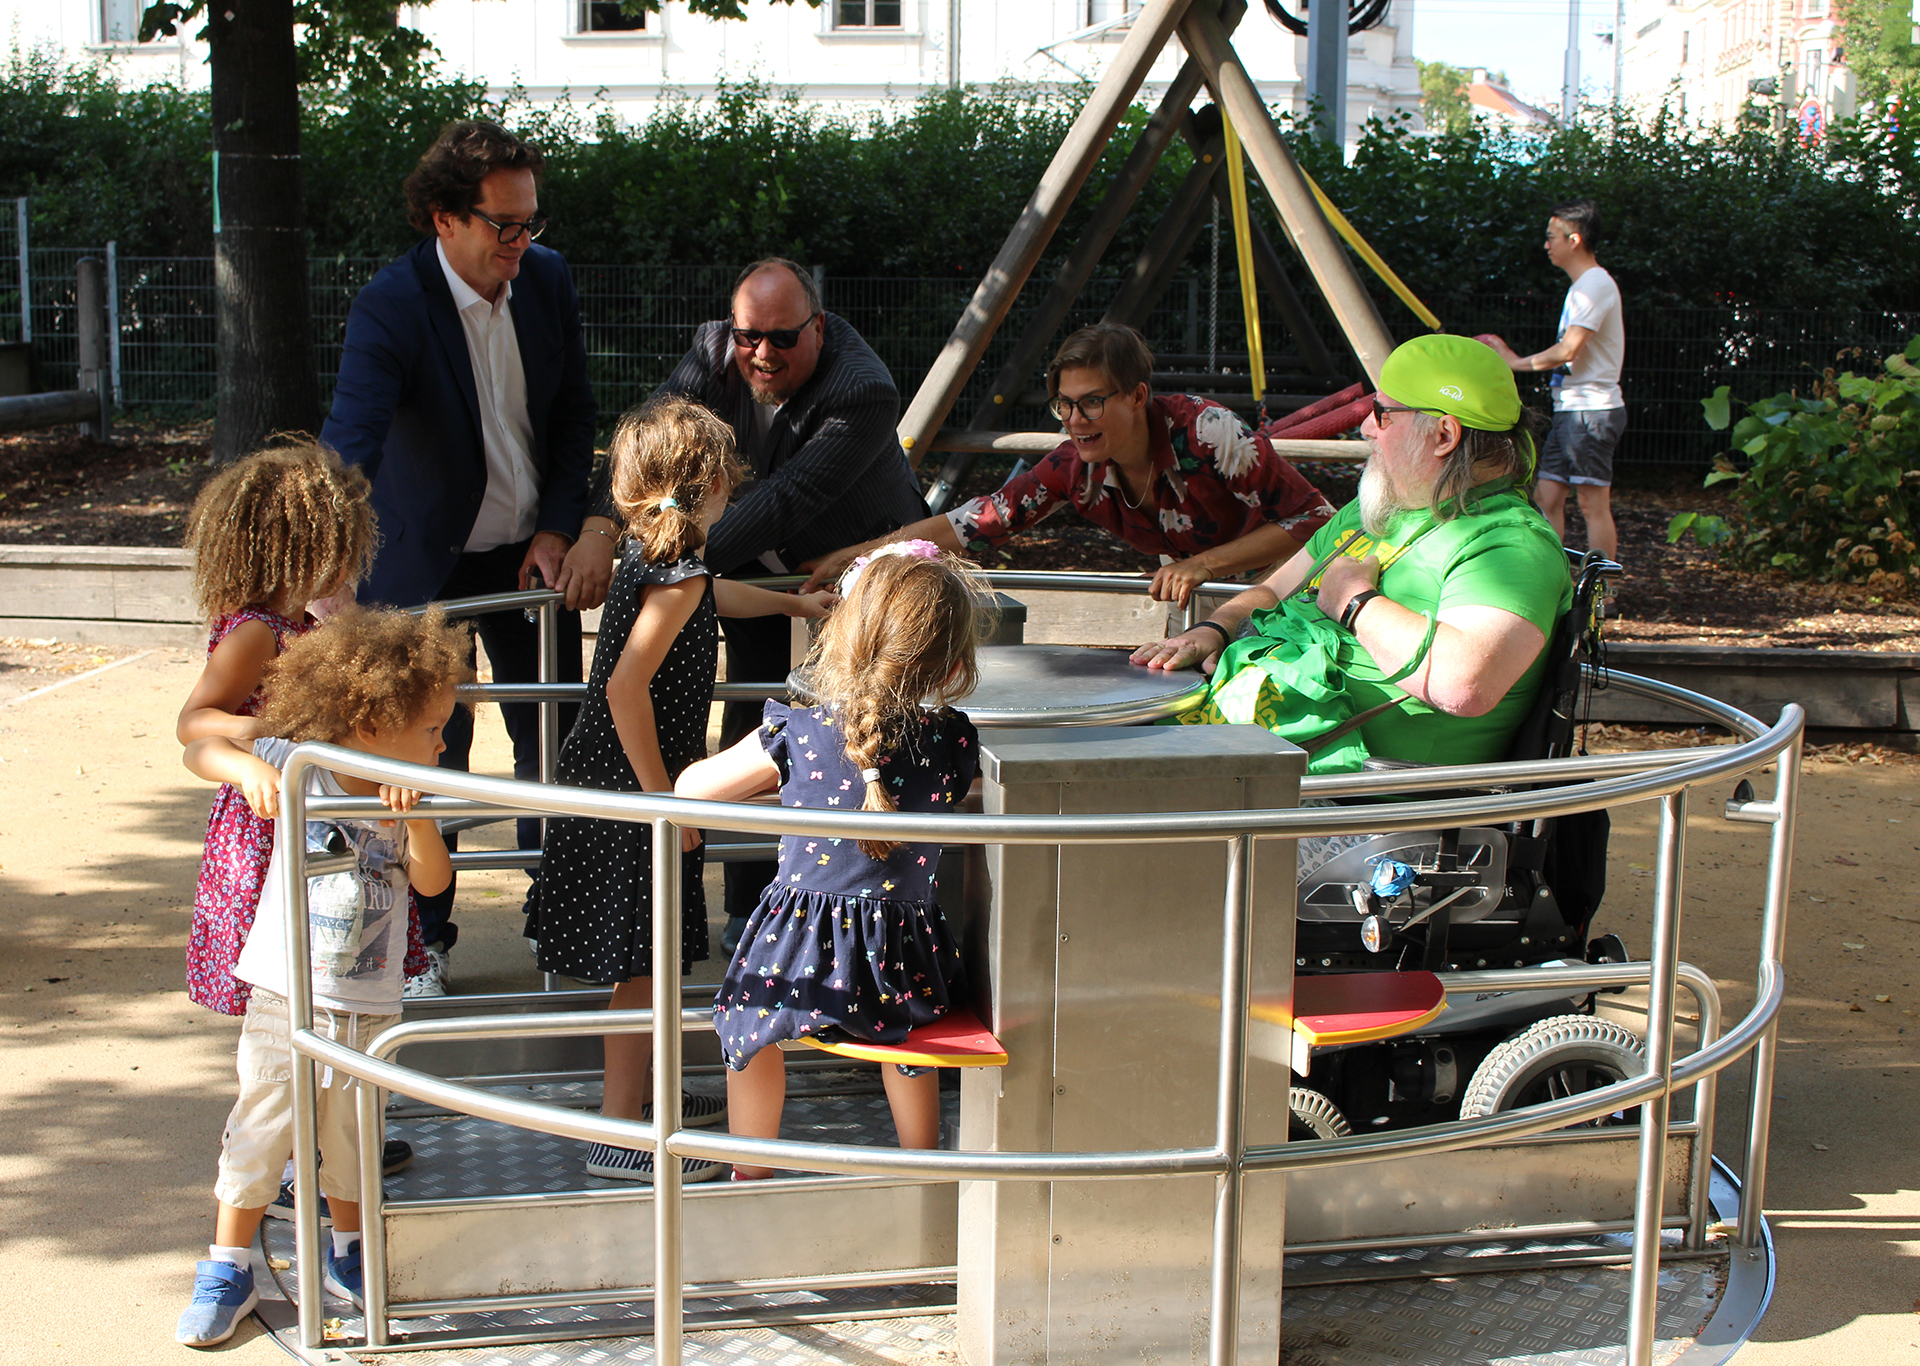 Karusell am Inklusions-Spielplatz im Weghuberpark